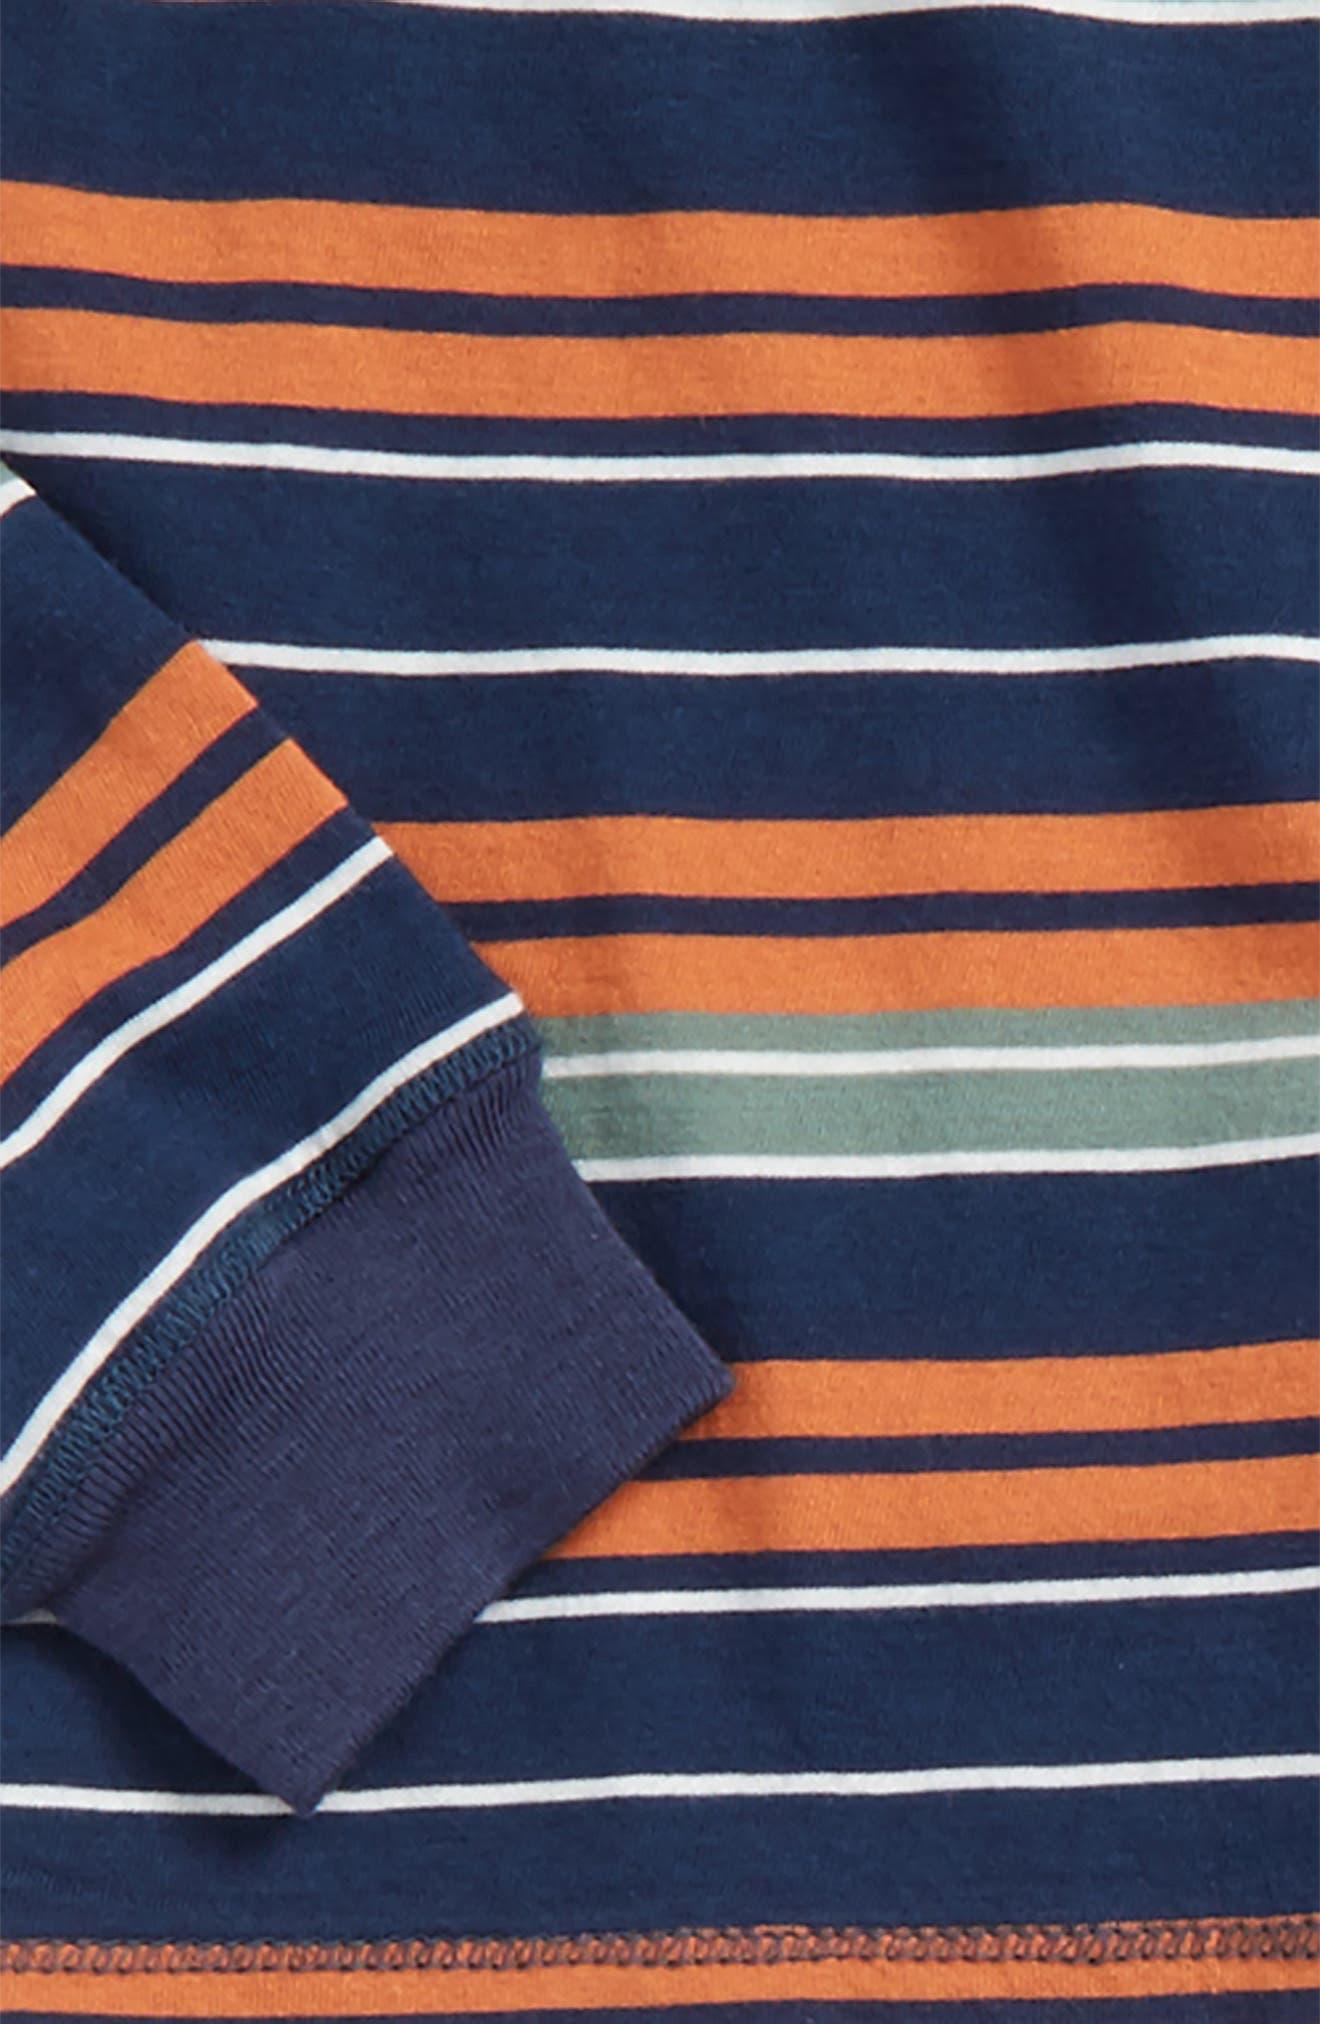 Stripe Henley Top & Sweatpants,                             Alternate thumbnail 2, color,